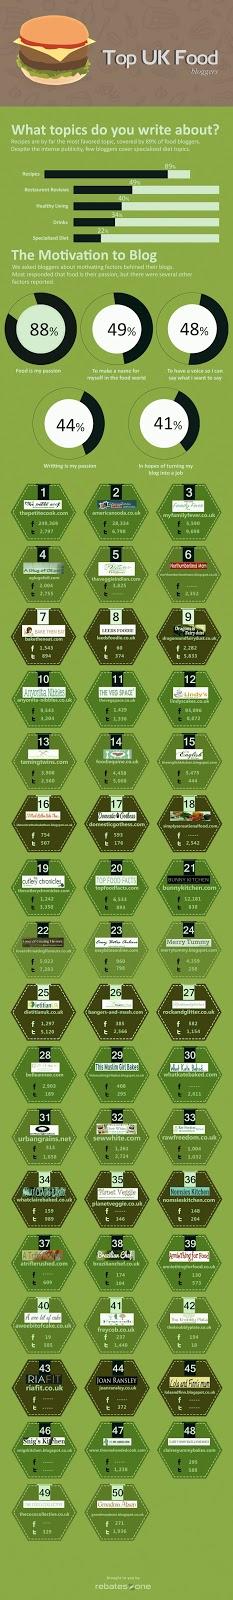 Rebate Zone's Top 50 UK Food Blogs Infographic